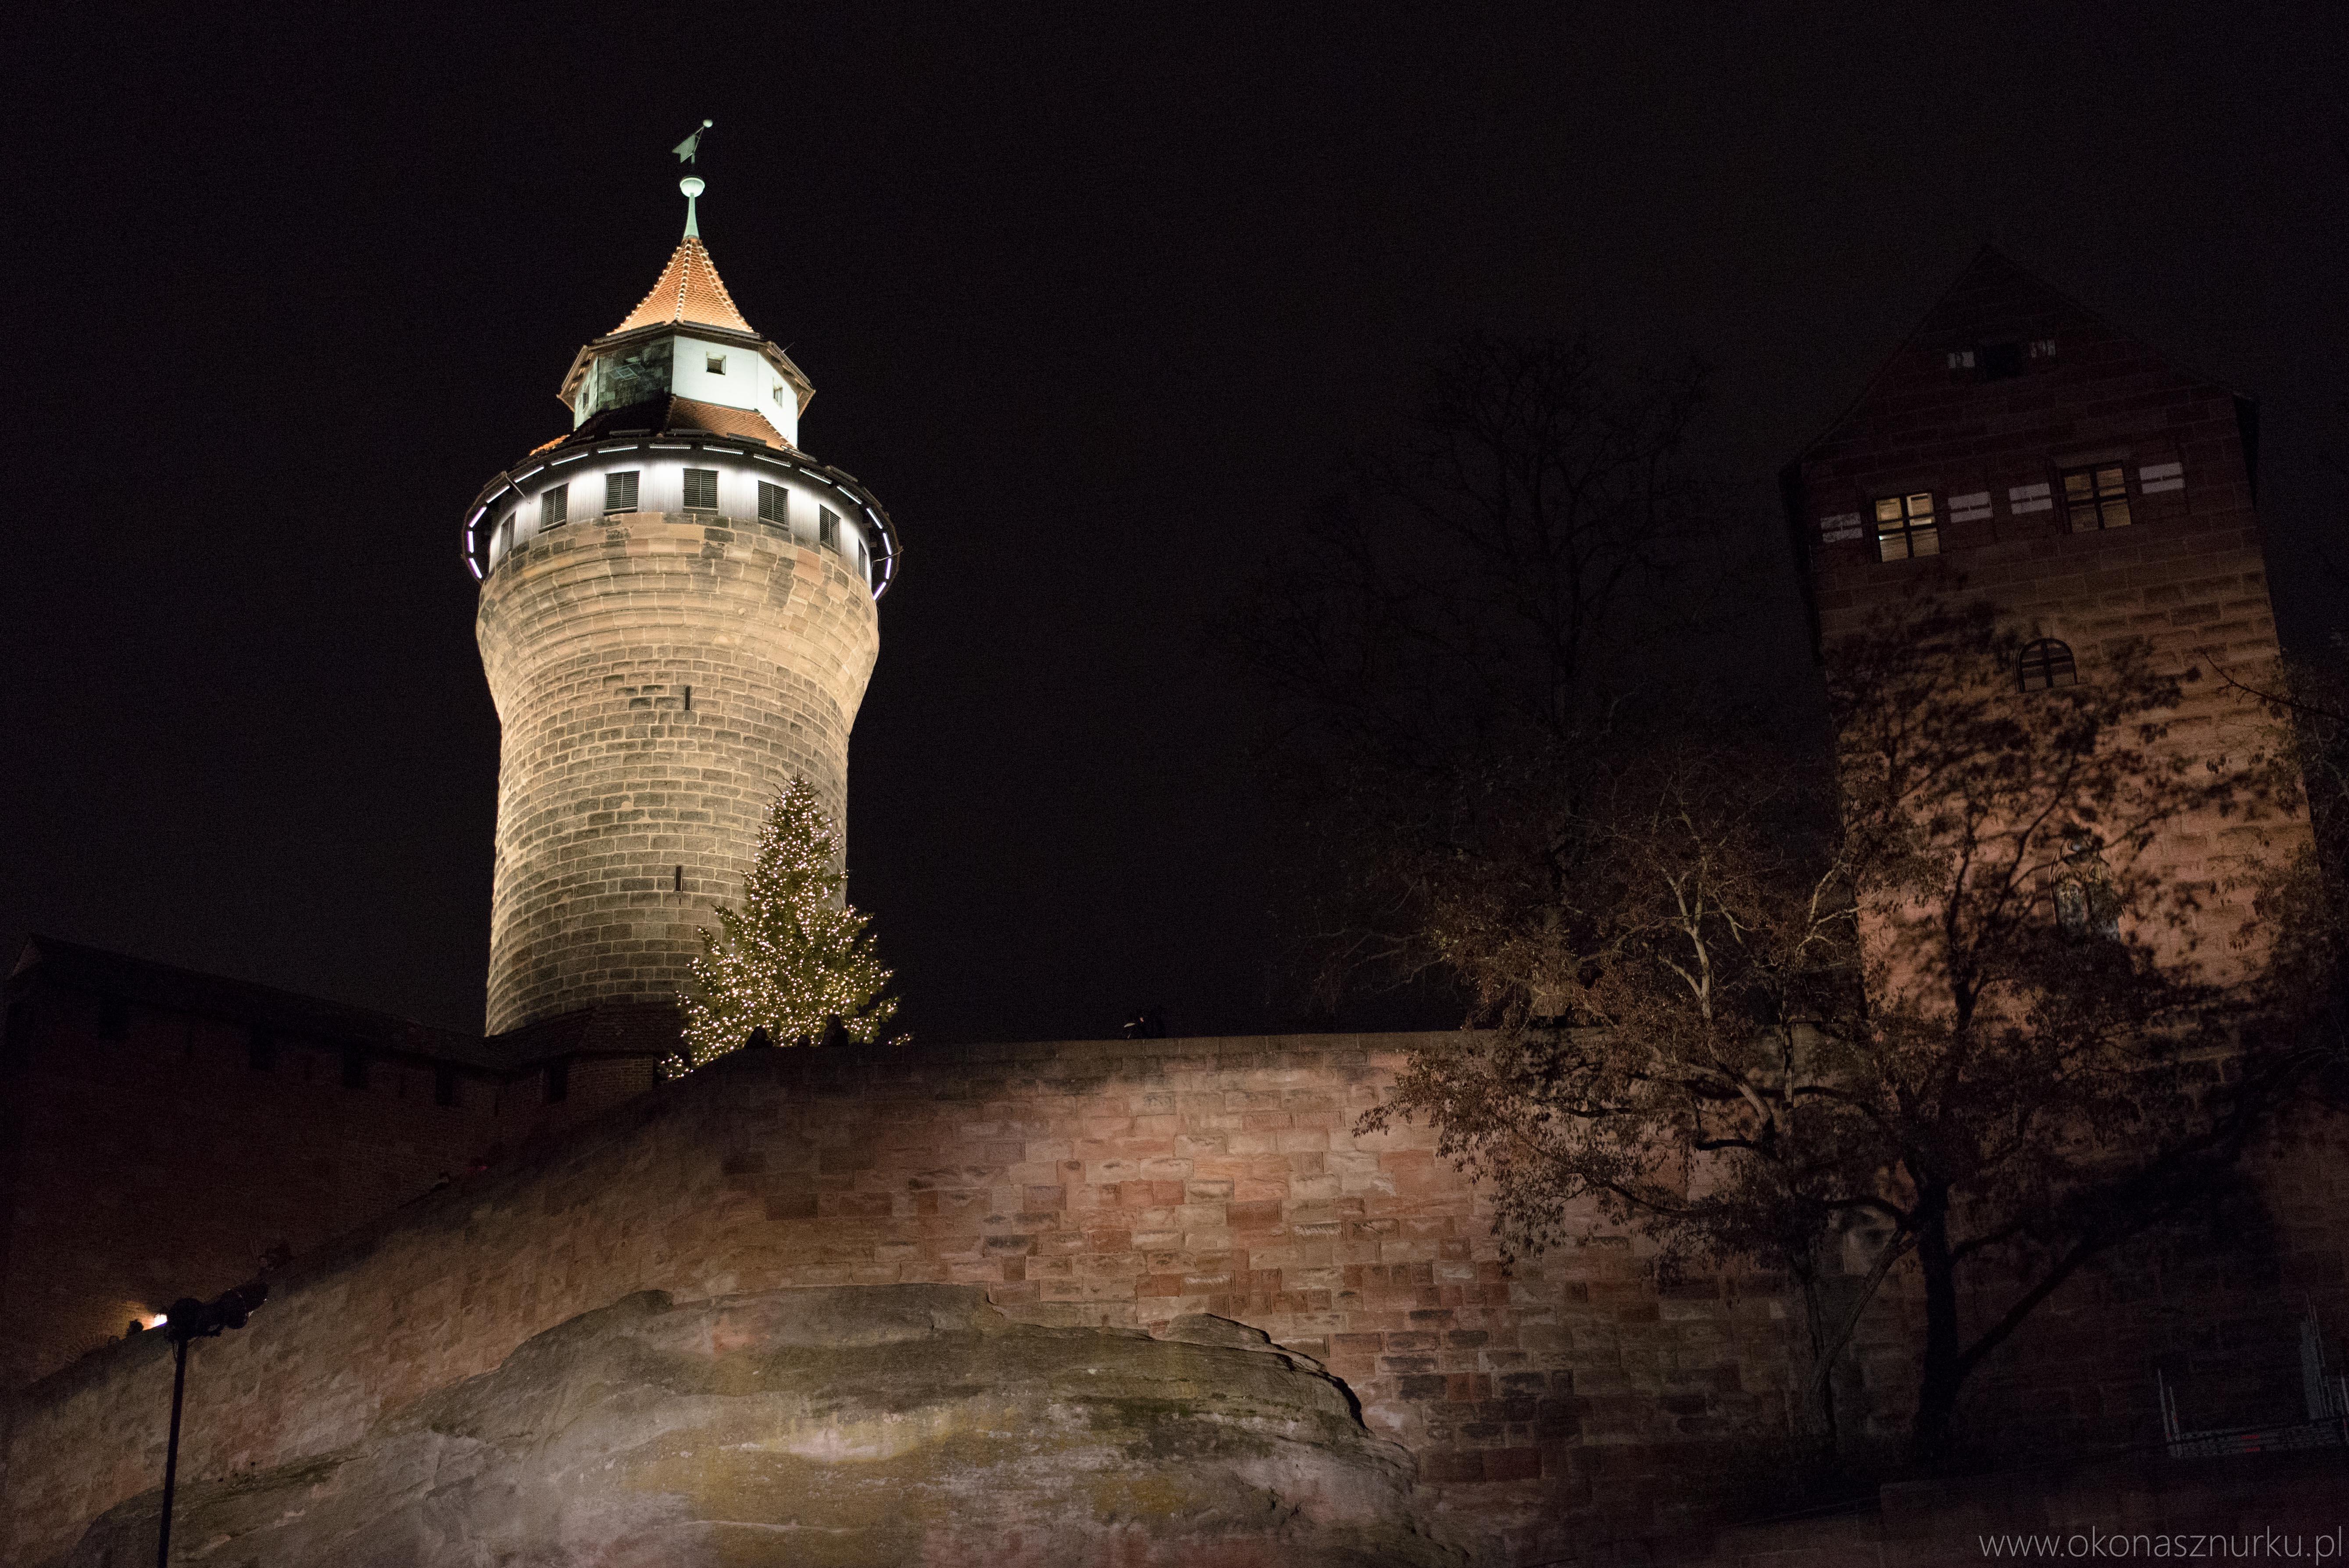 Nürnberg-stadt-norymberga-bayern-city-frankonia (12)